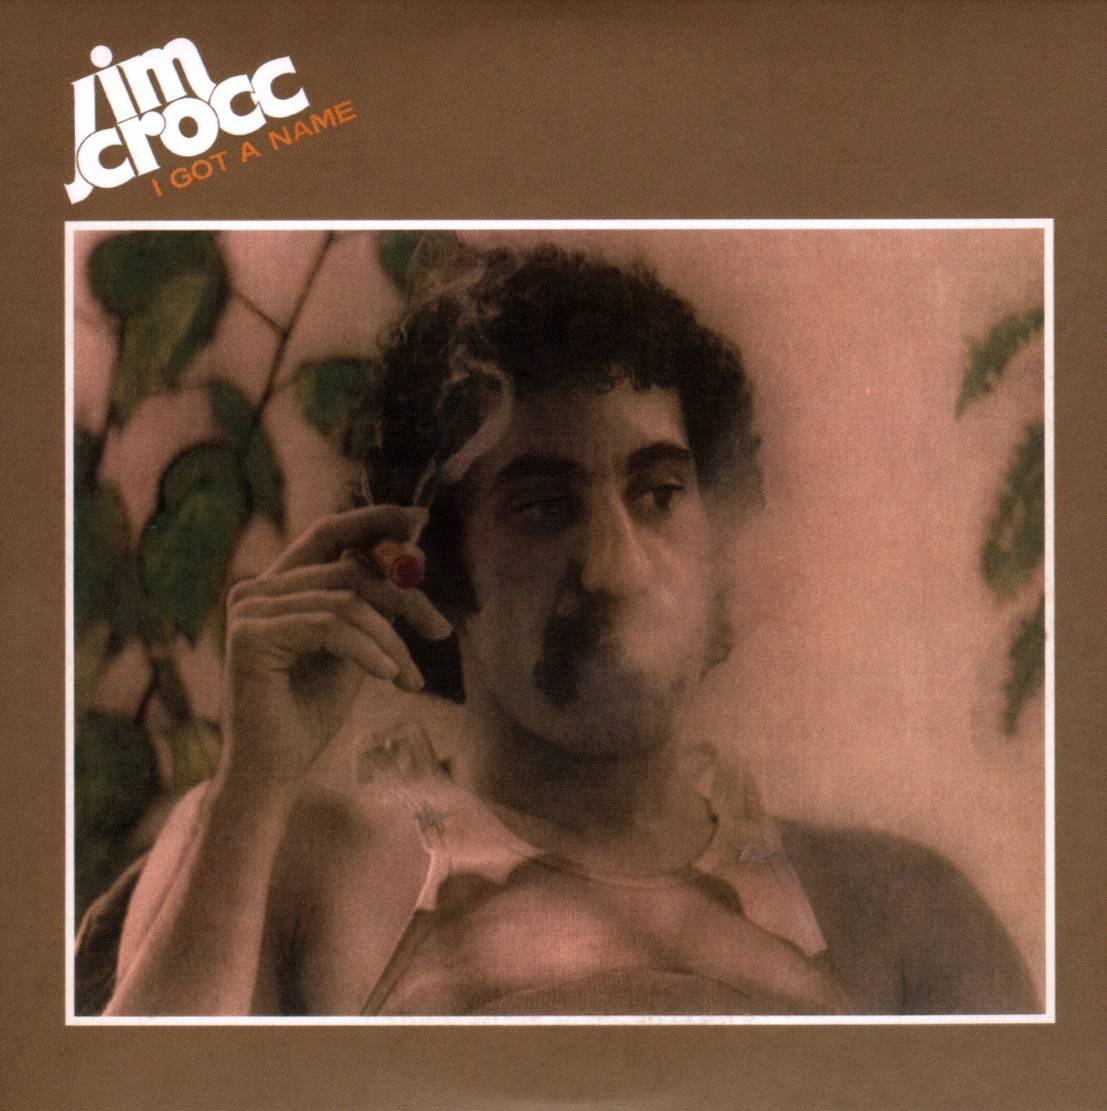 Jim Croce - The Studio Album Collection (1966-1973) {7 CD Box Set Limited Edition Edsel Records CROCEBOX01 rel 2015}